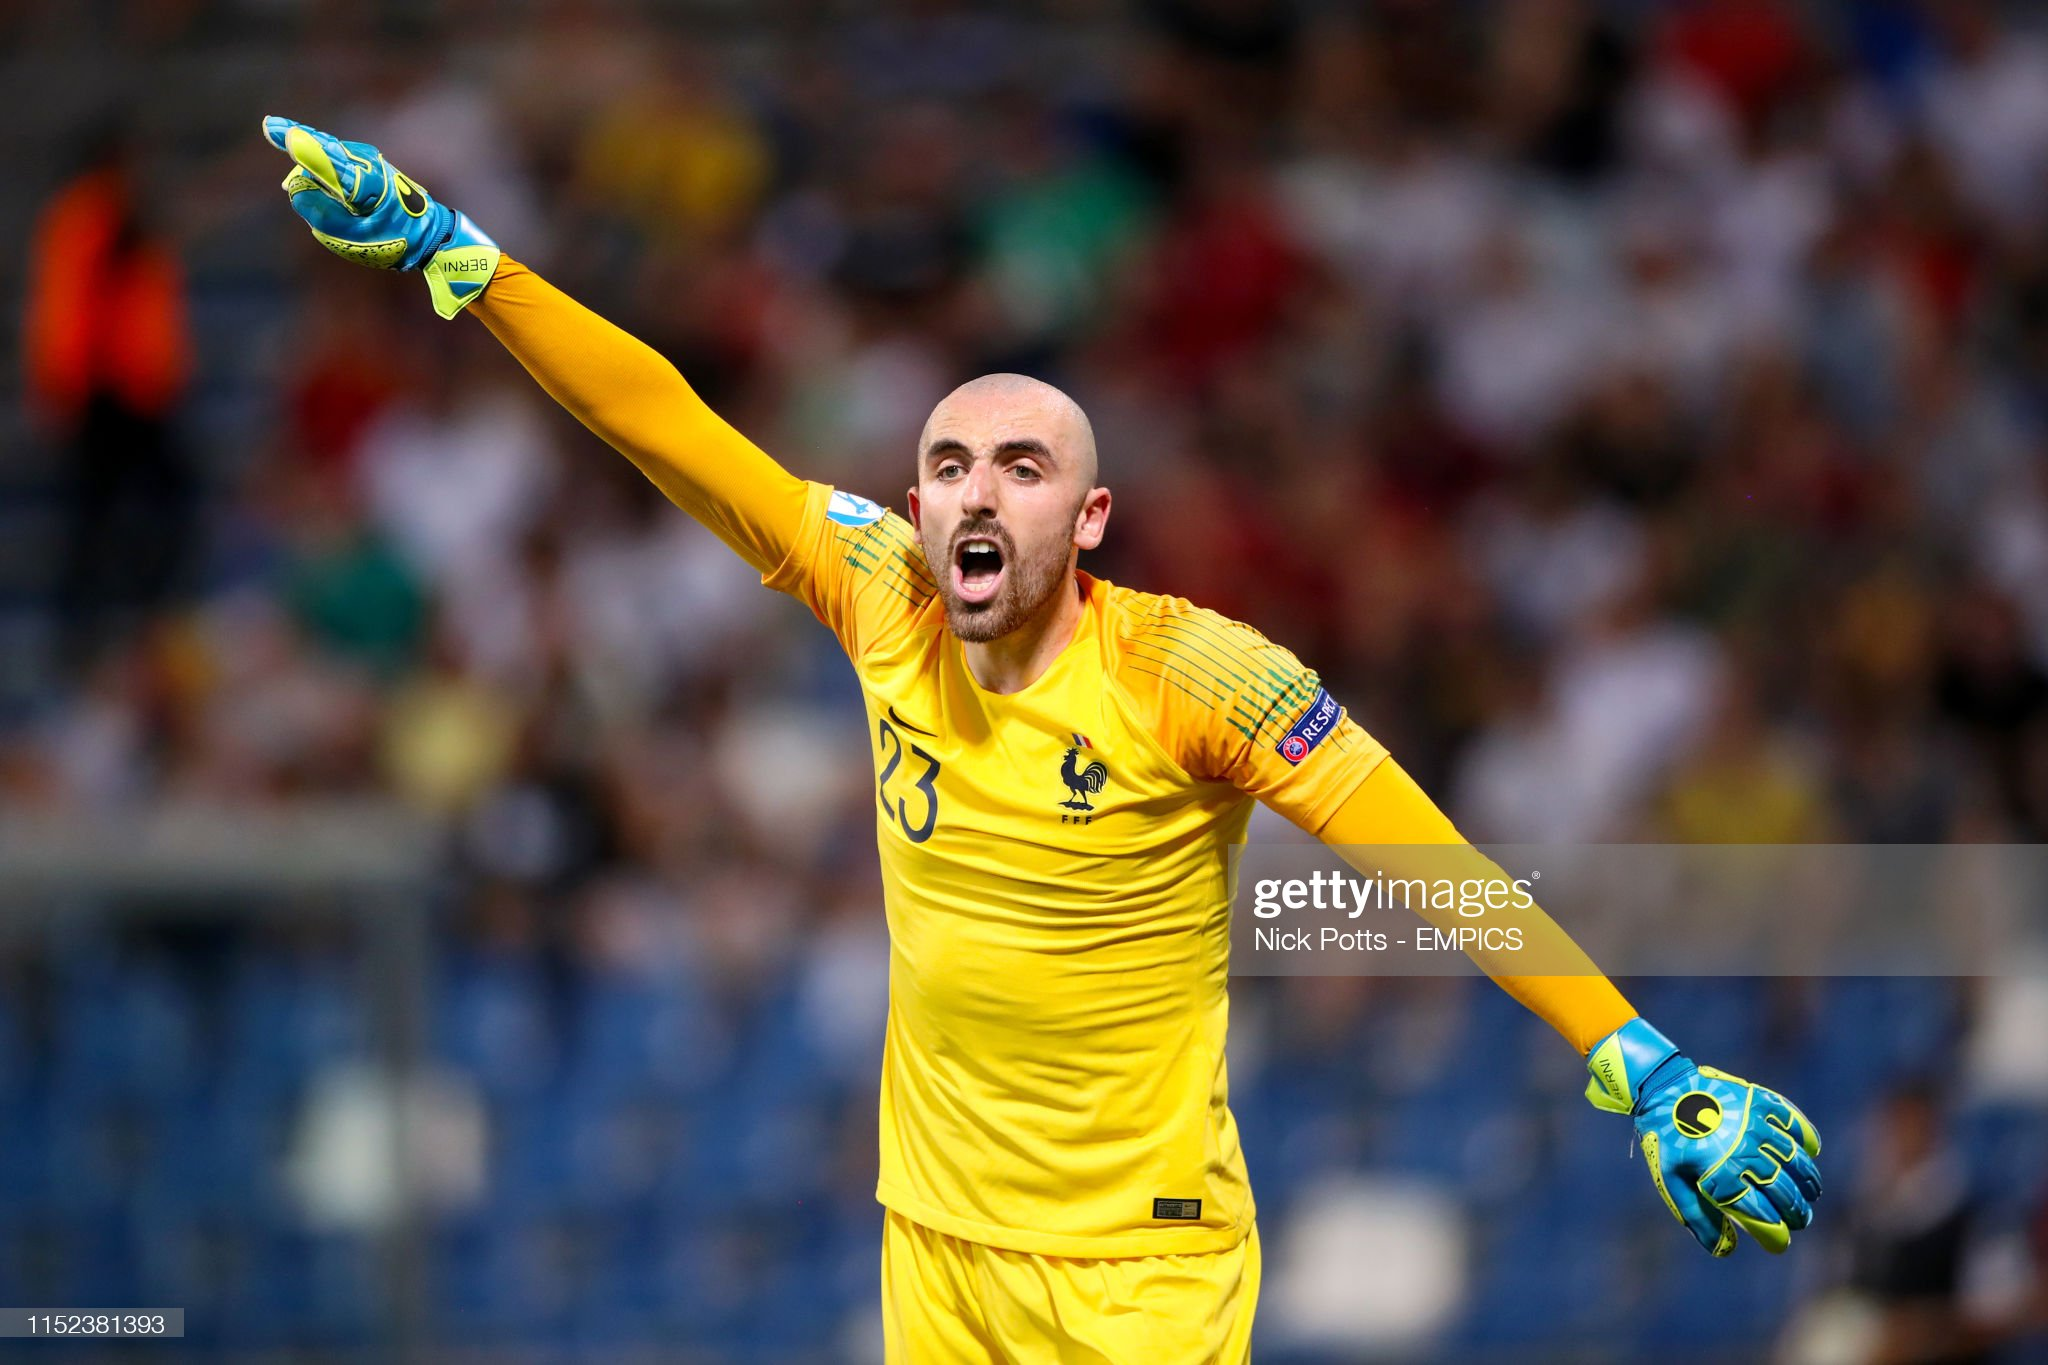 Spain U21 v France U21 - UEFA European Under-21 Championship - Semi Final - Mapei Stadium : Fotografia de notícias